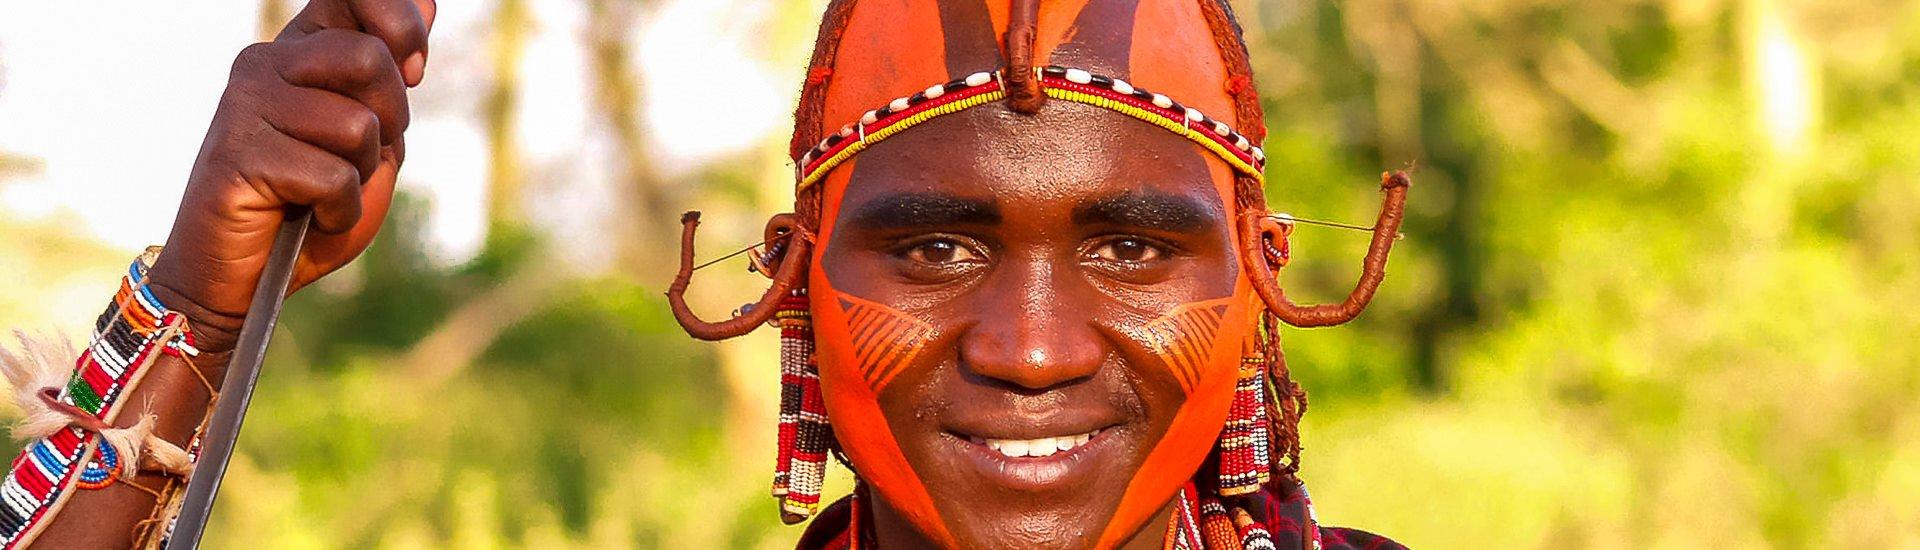 Masai Mara -  Kenia Naturreisen Tansania Tierbeobachtung